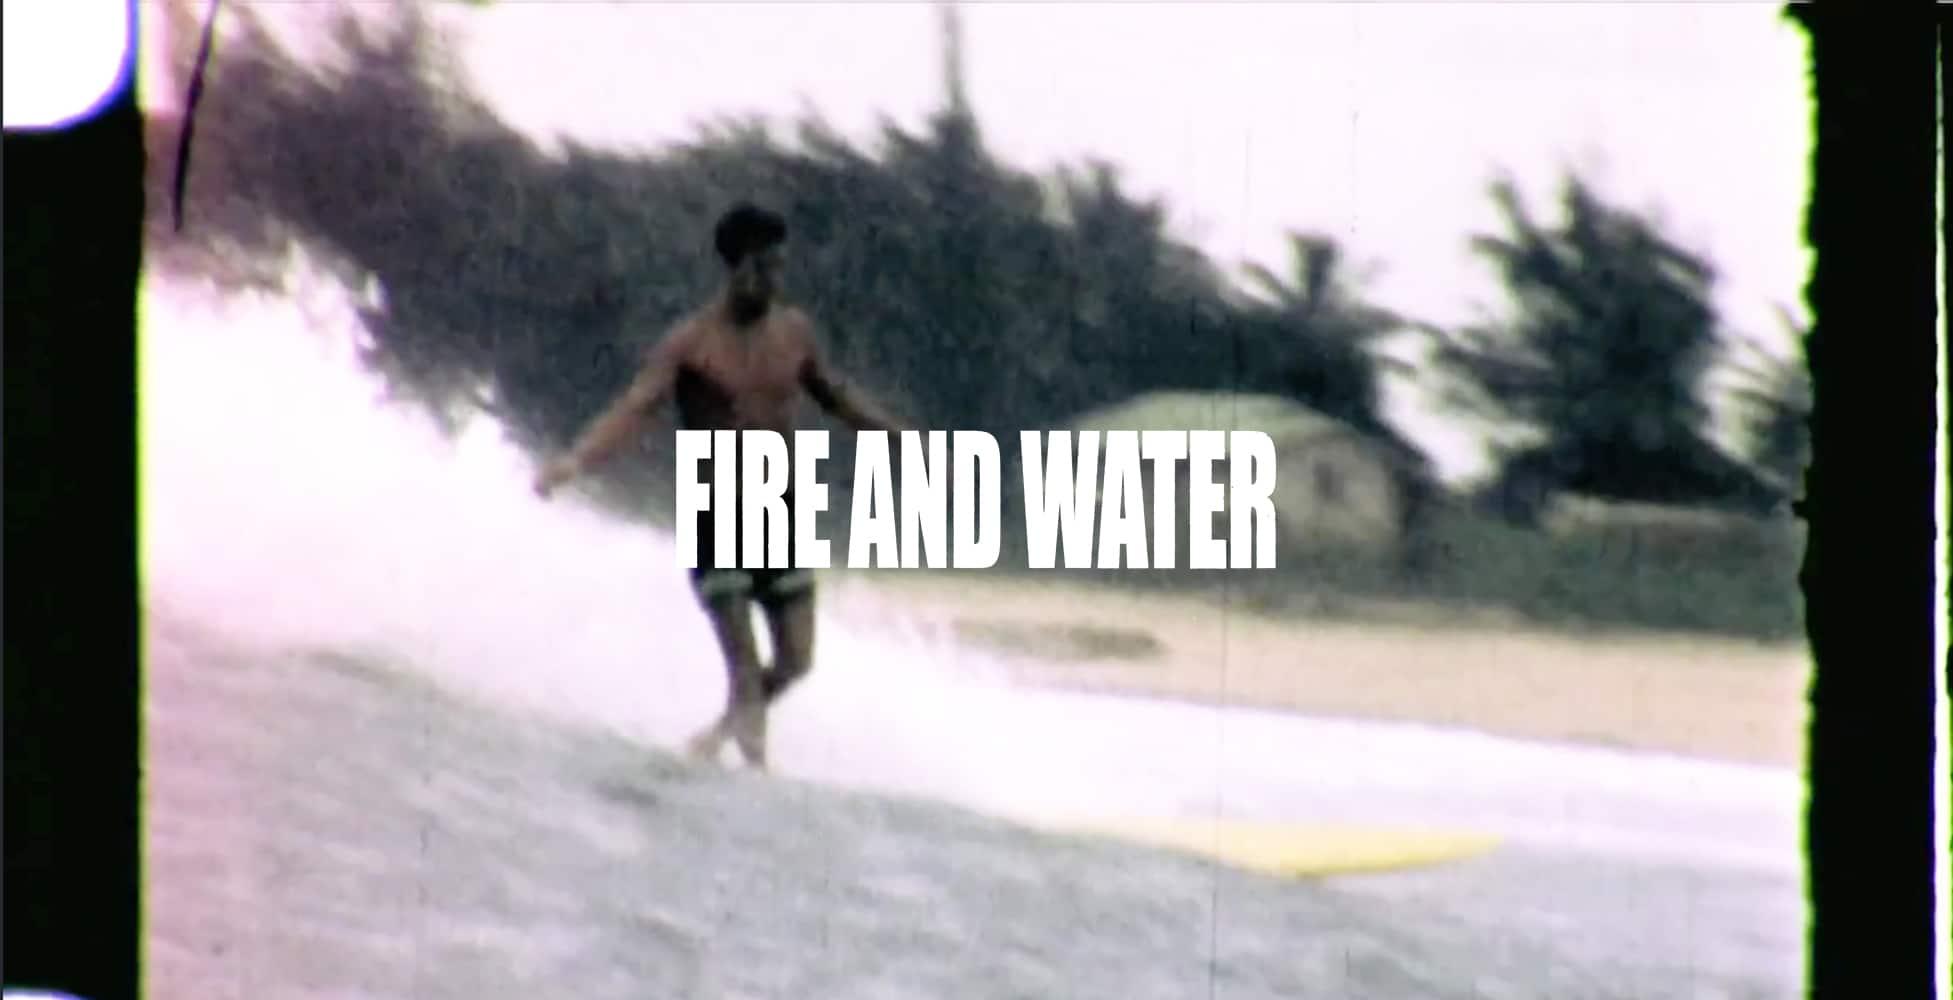 F&WaterTitle